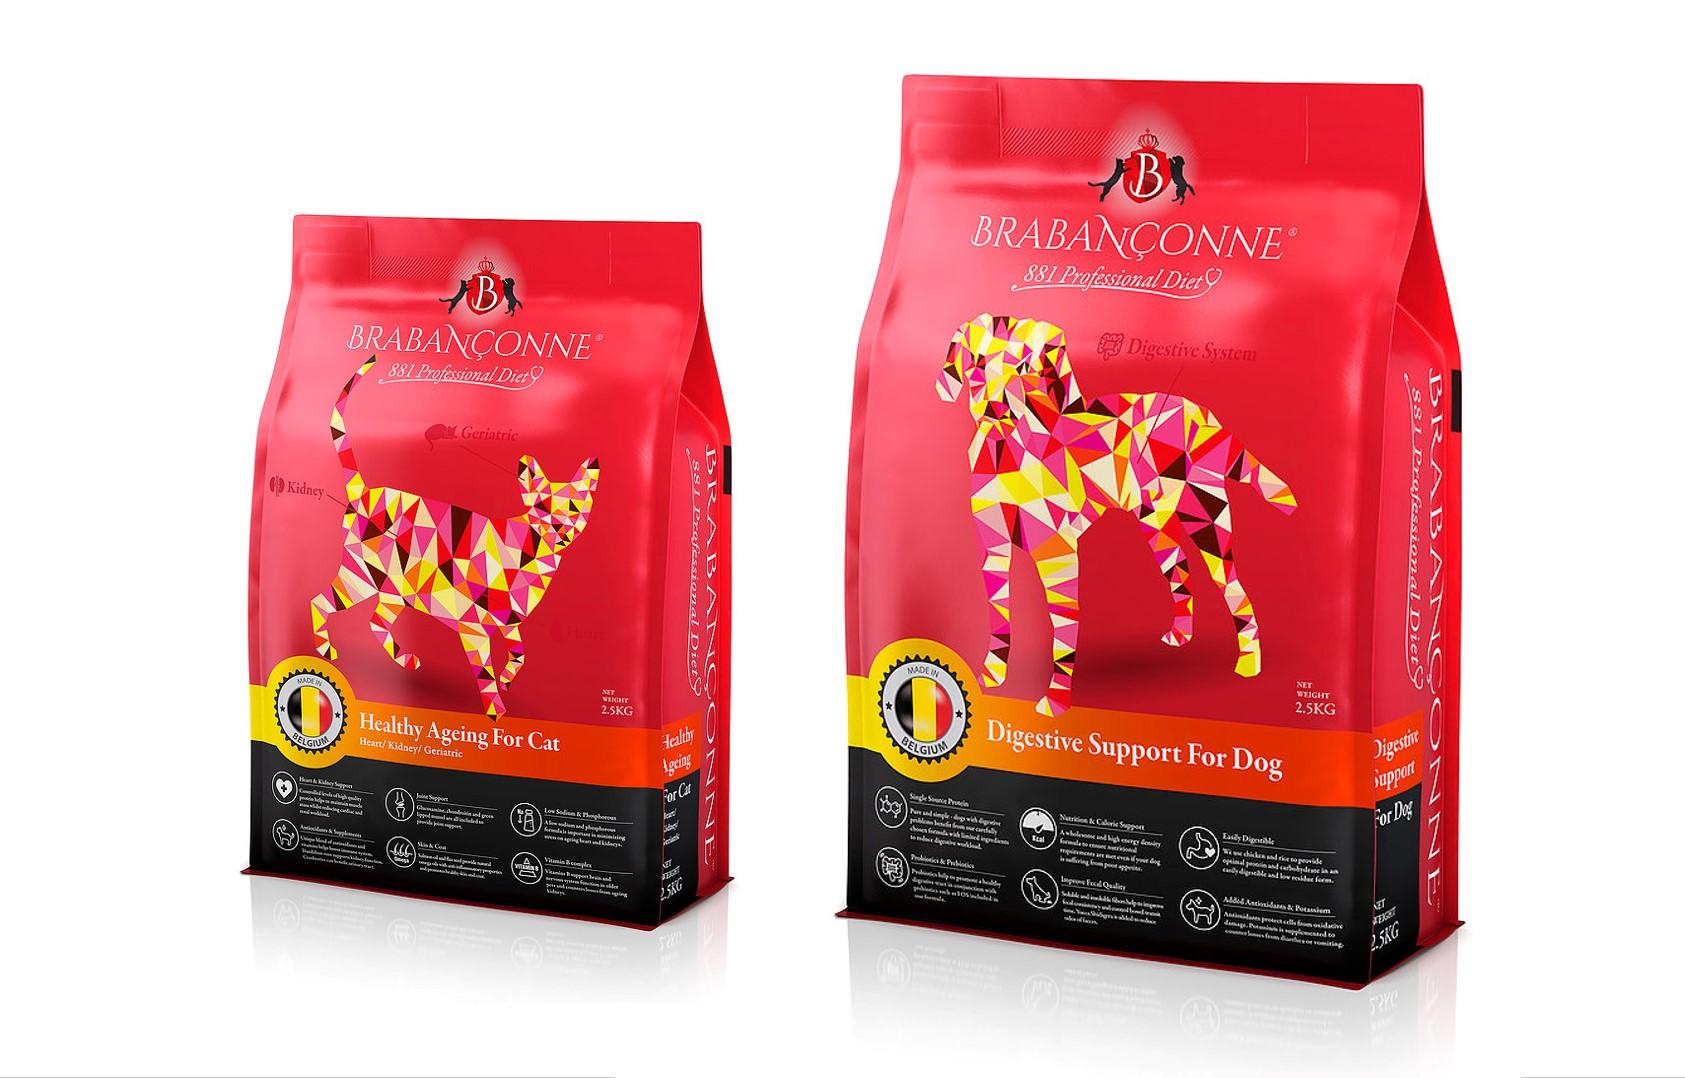 United Petfood | Packaging design